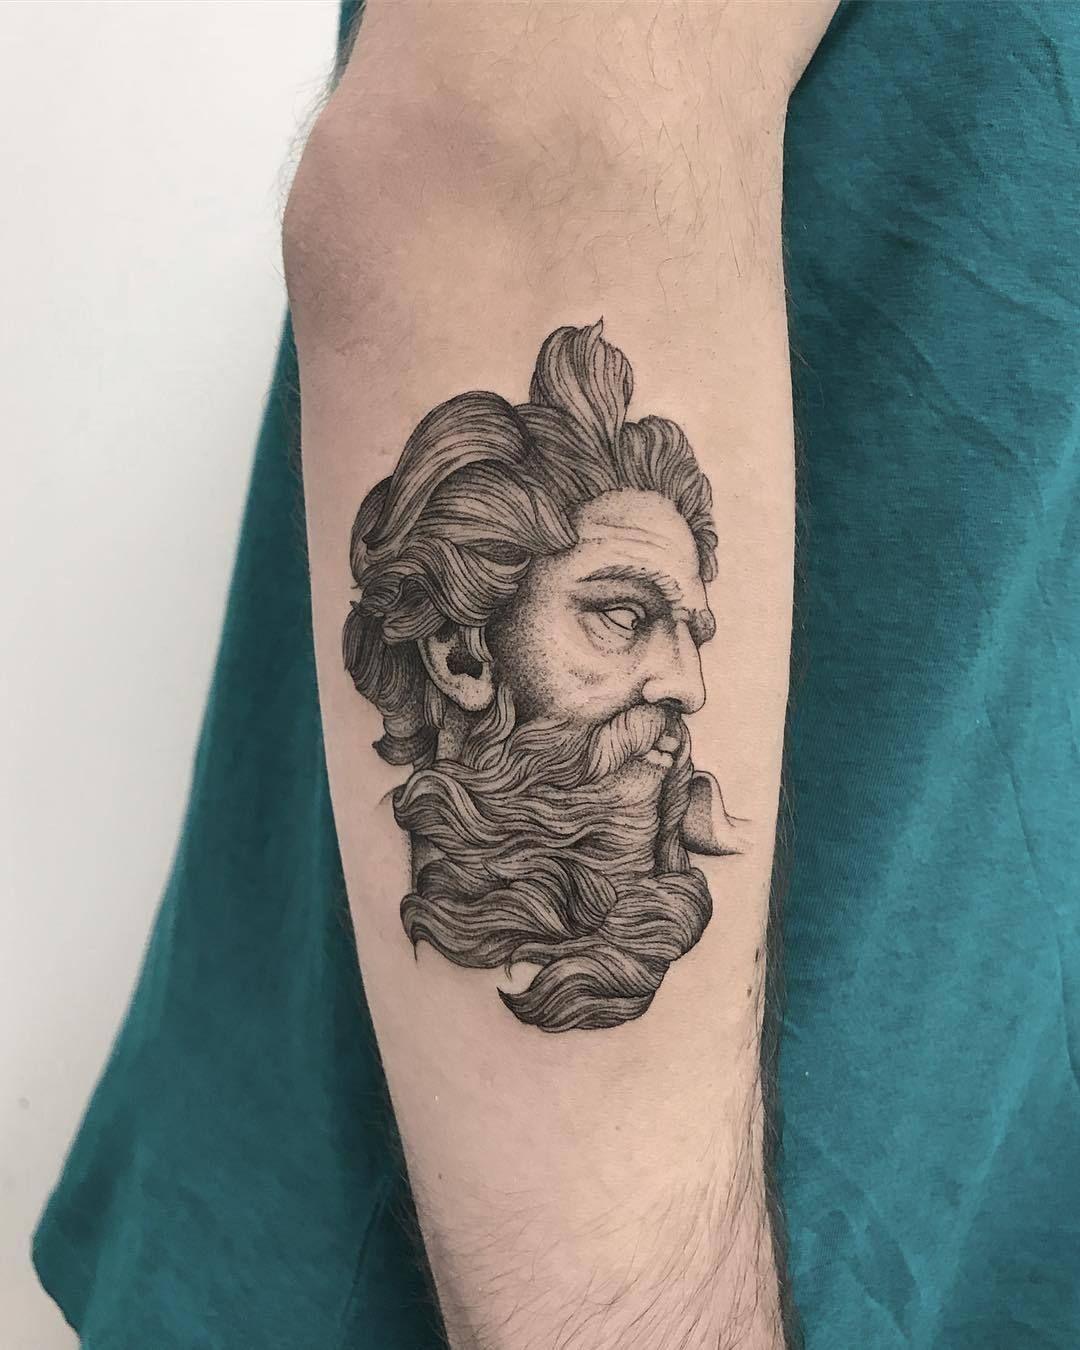 Zeus tattoo on arm